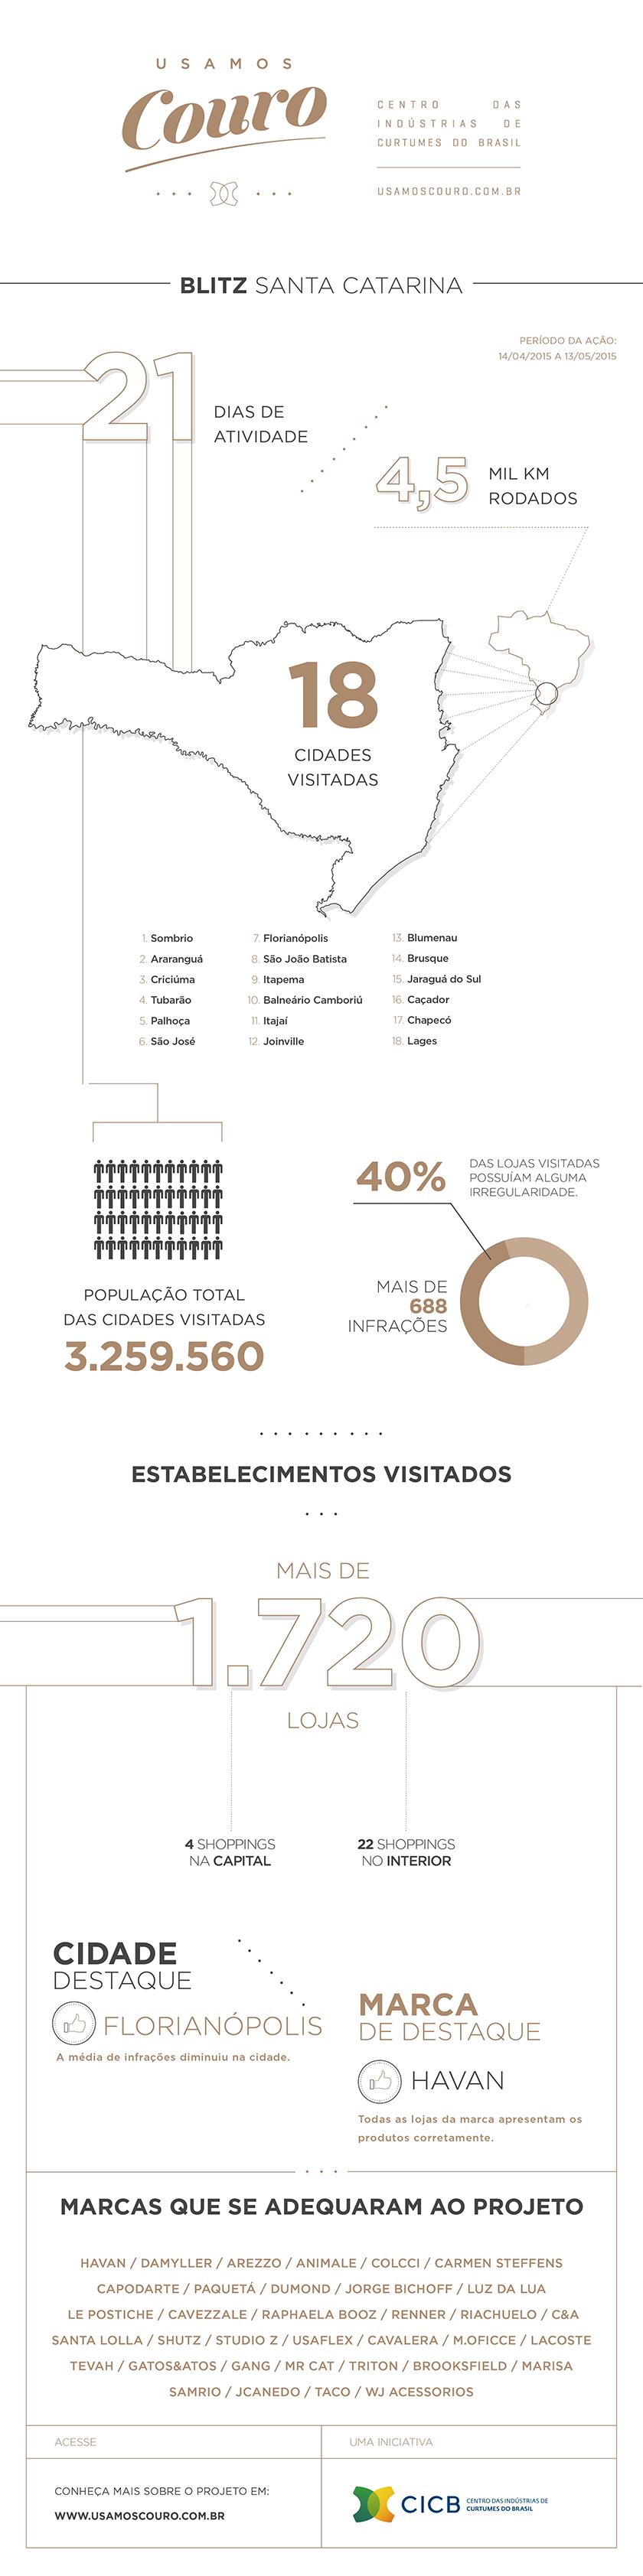 Infografico_leidocouro_SC